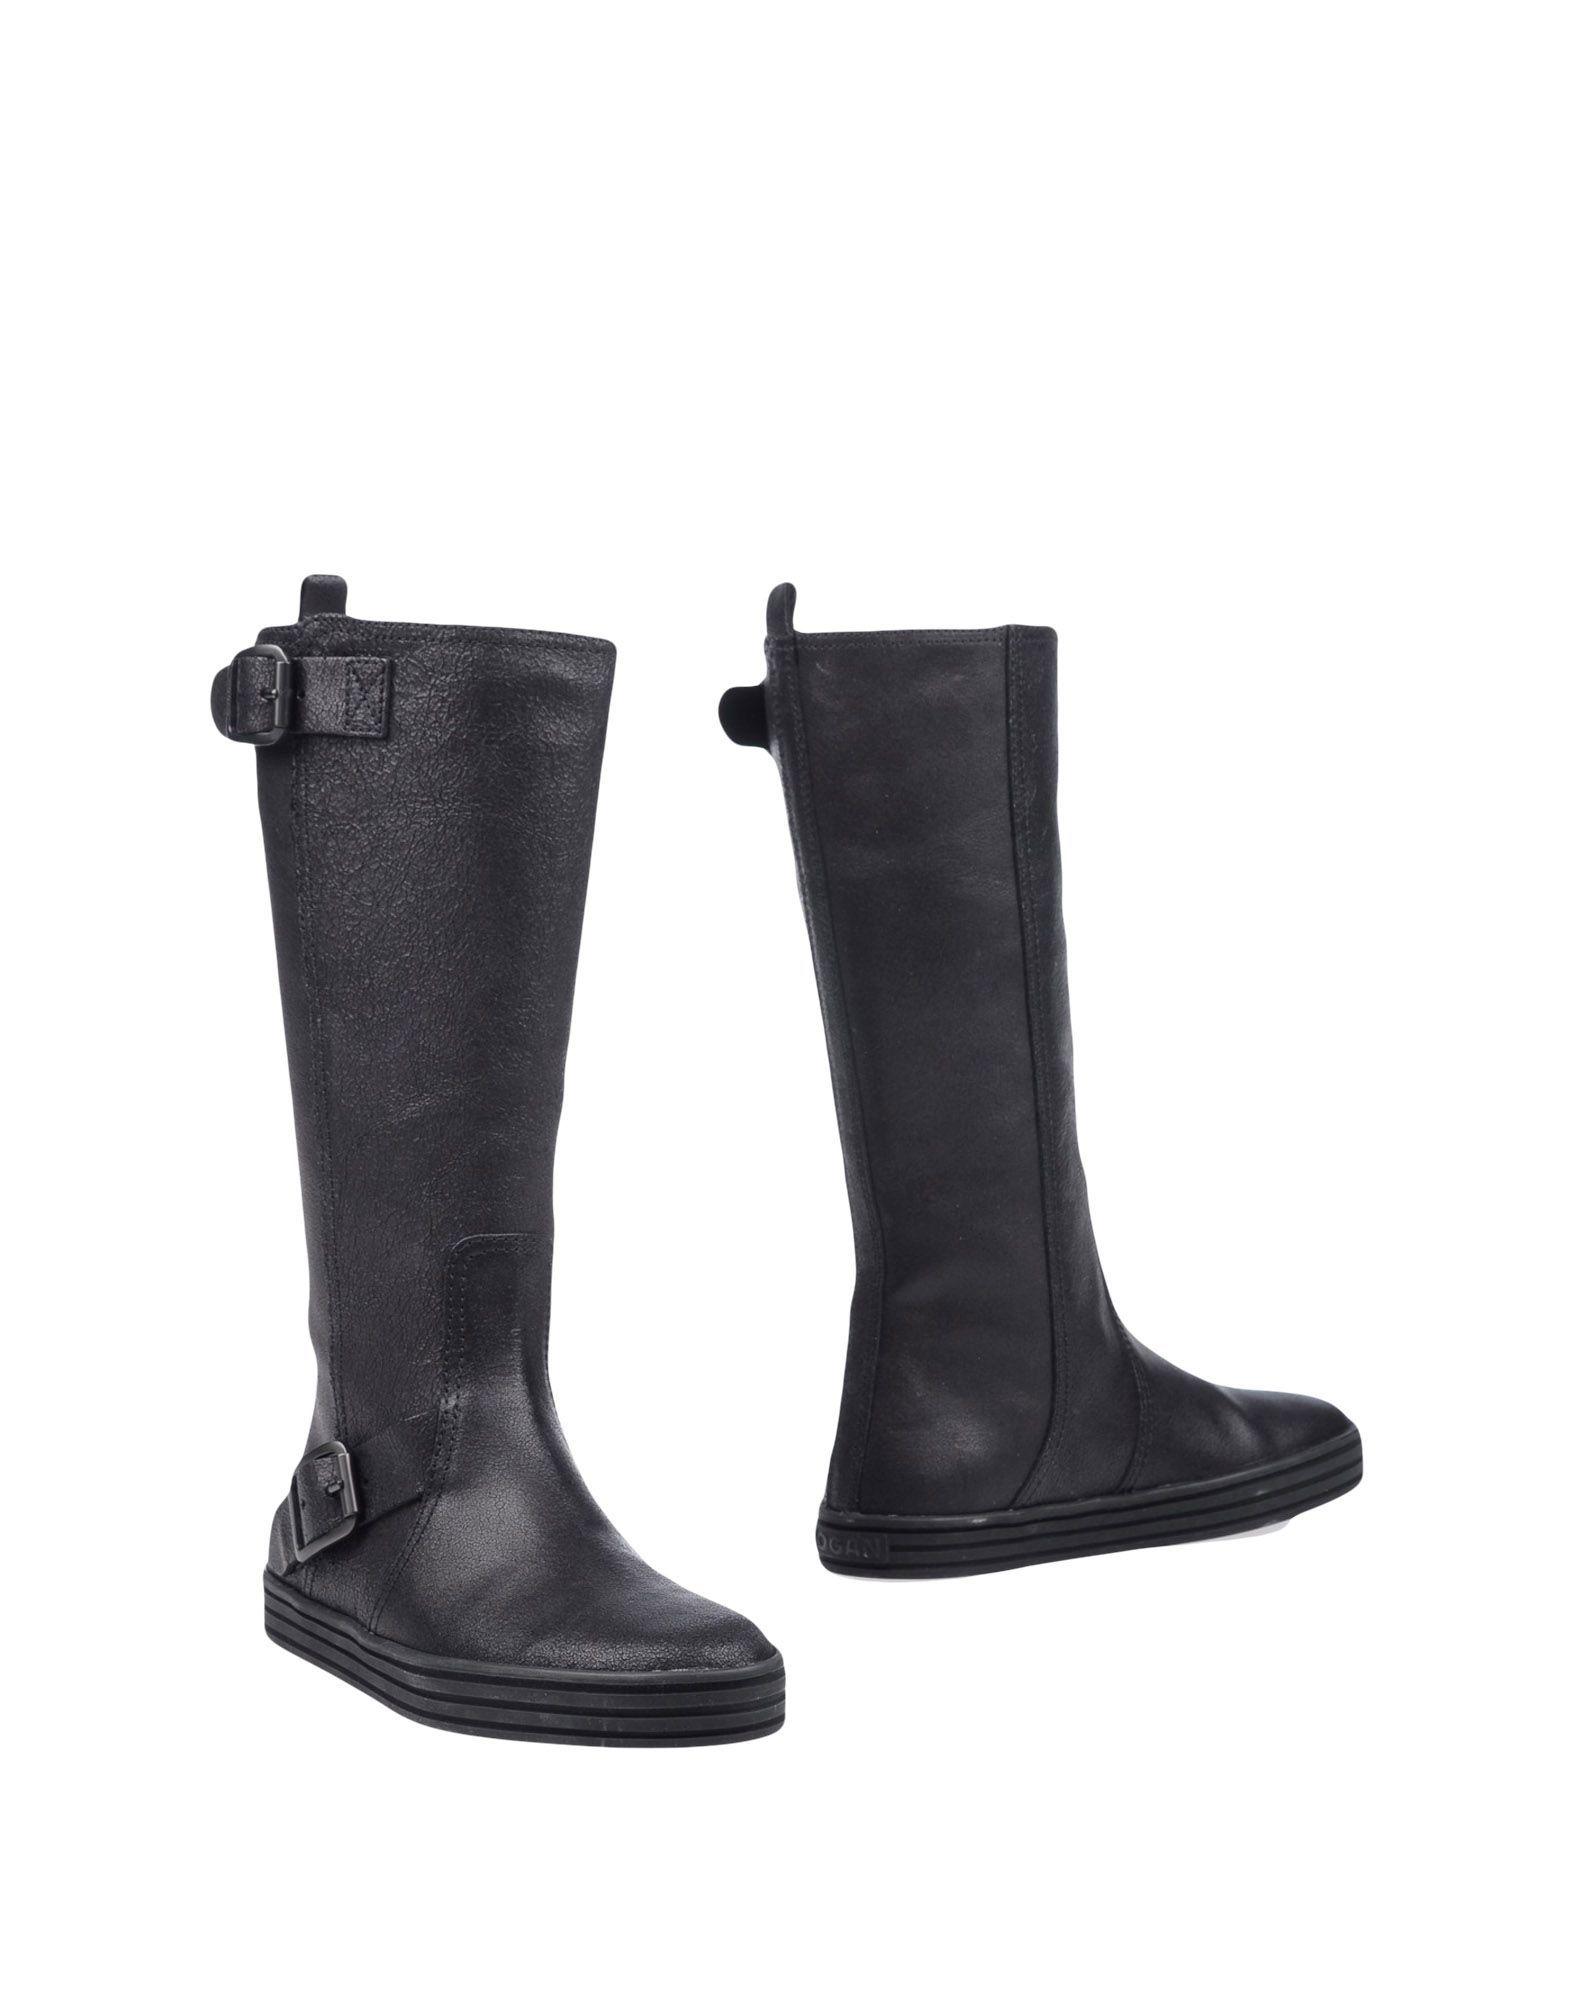 Hogan Rebel Black Leather Boots